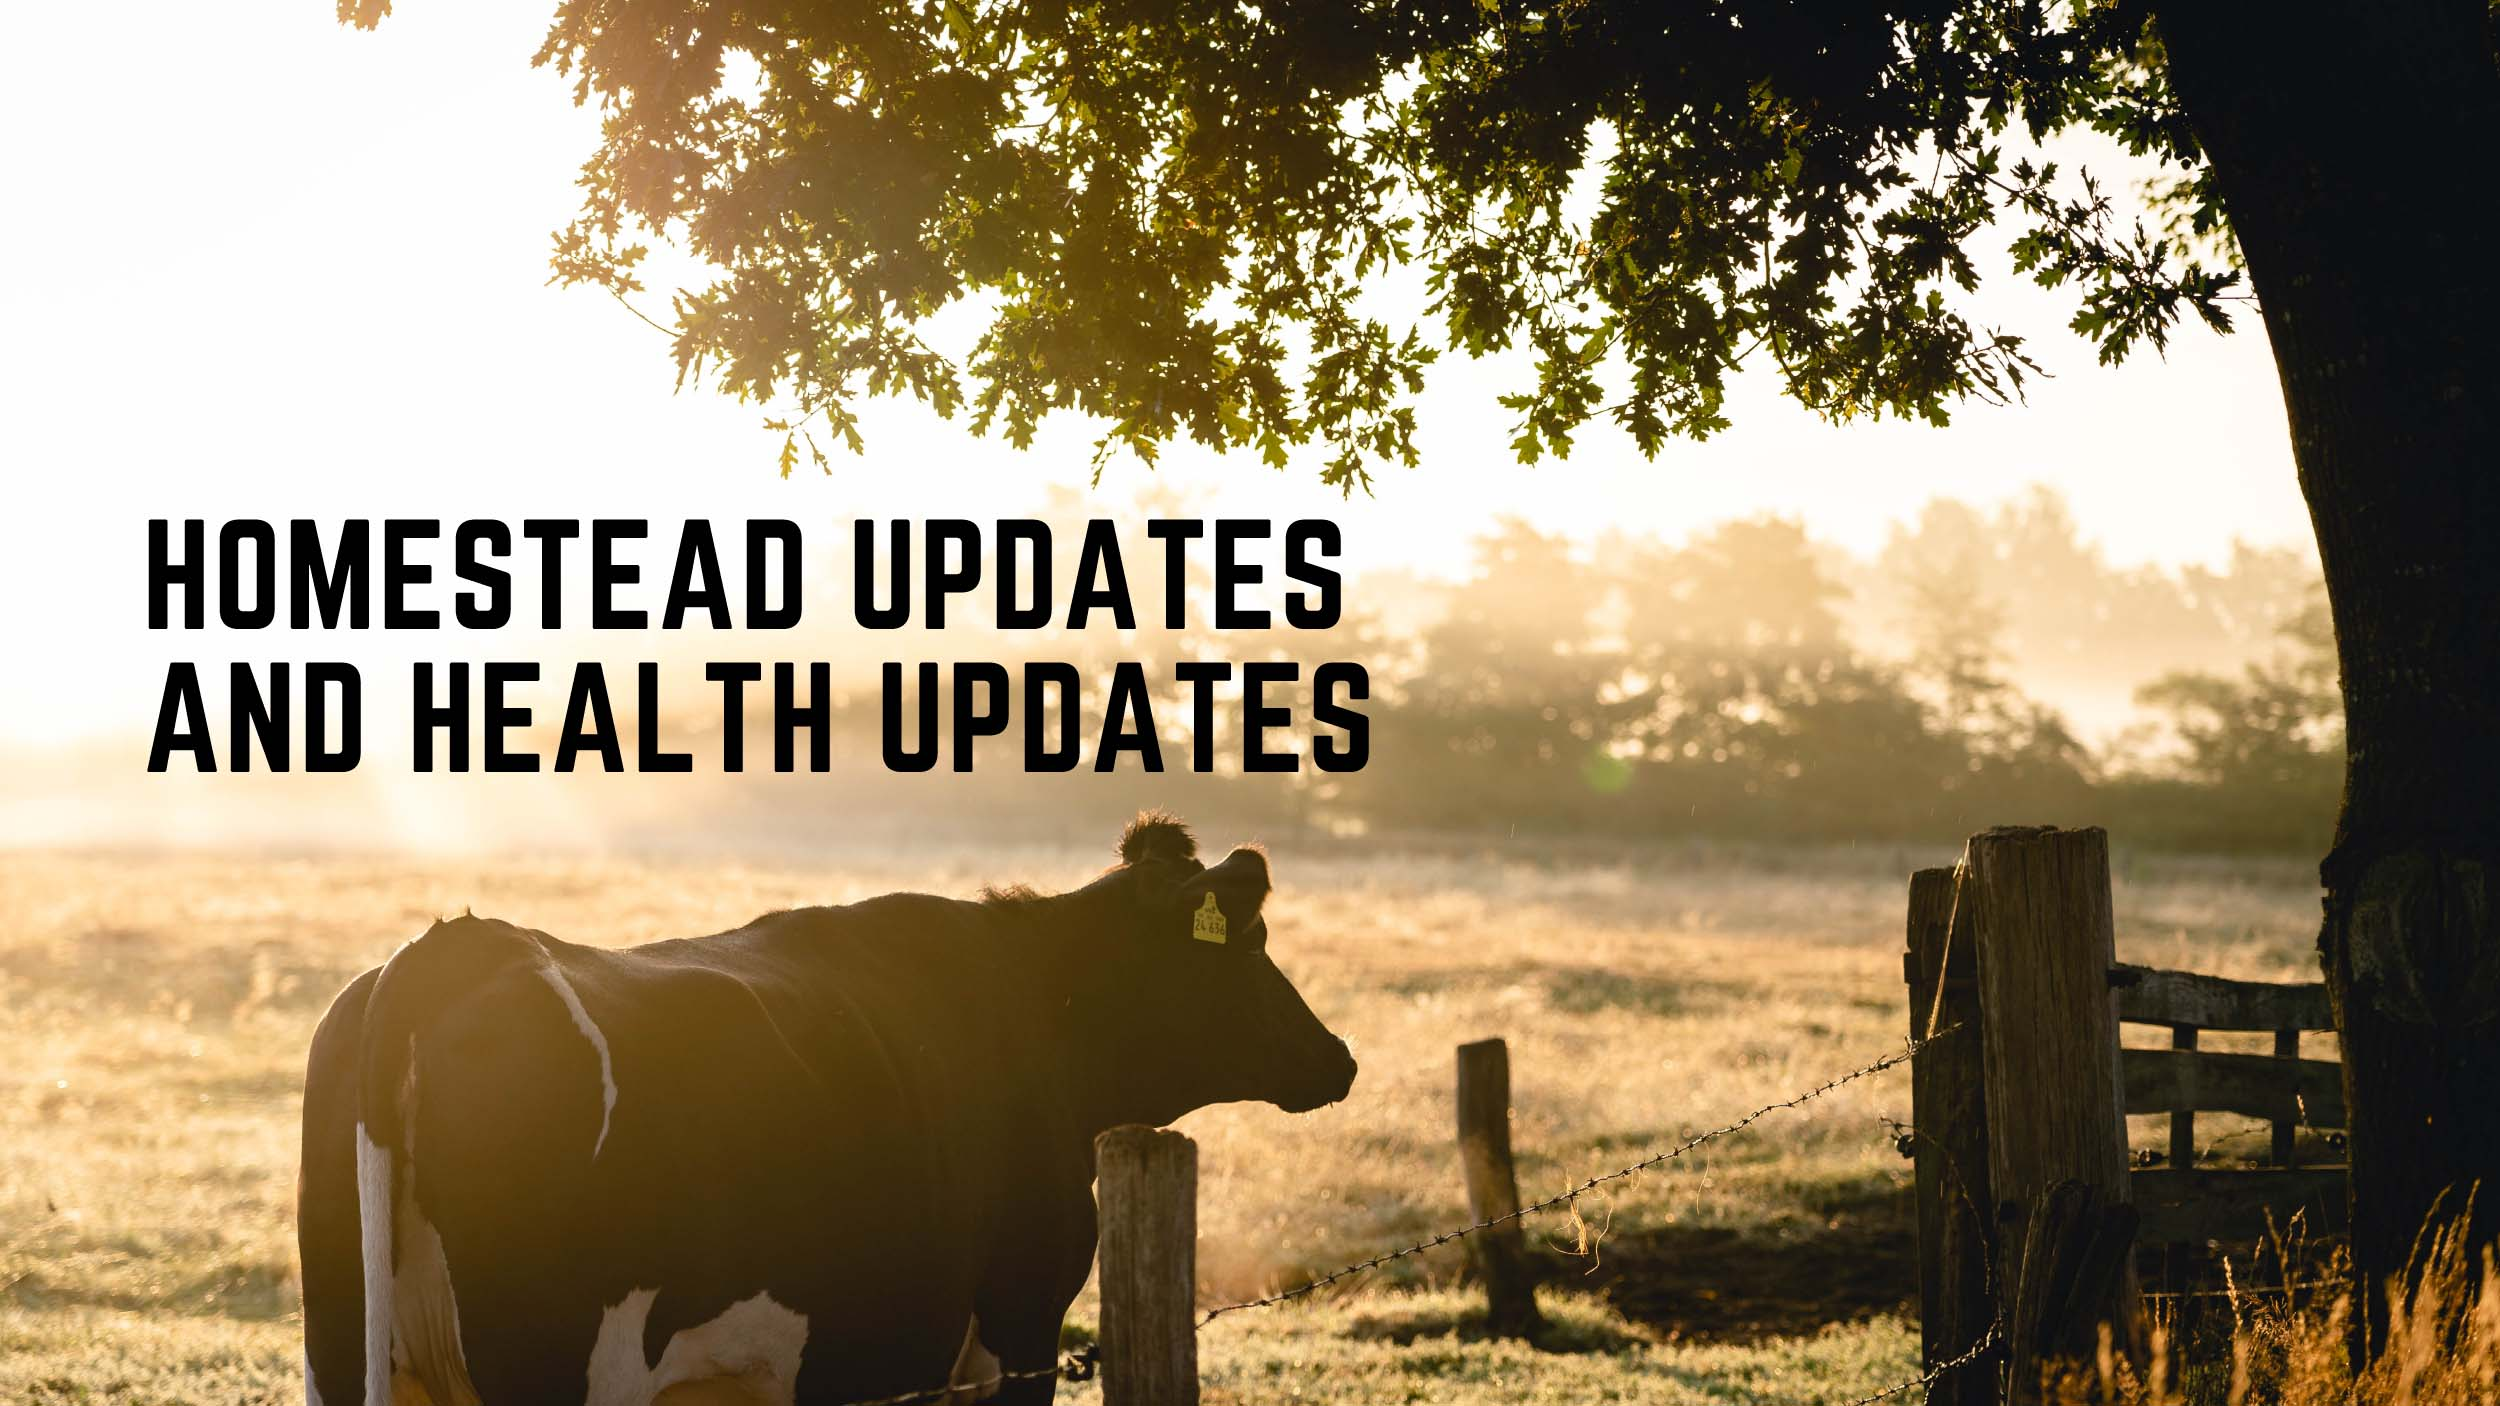 Homestead Update and Health Update